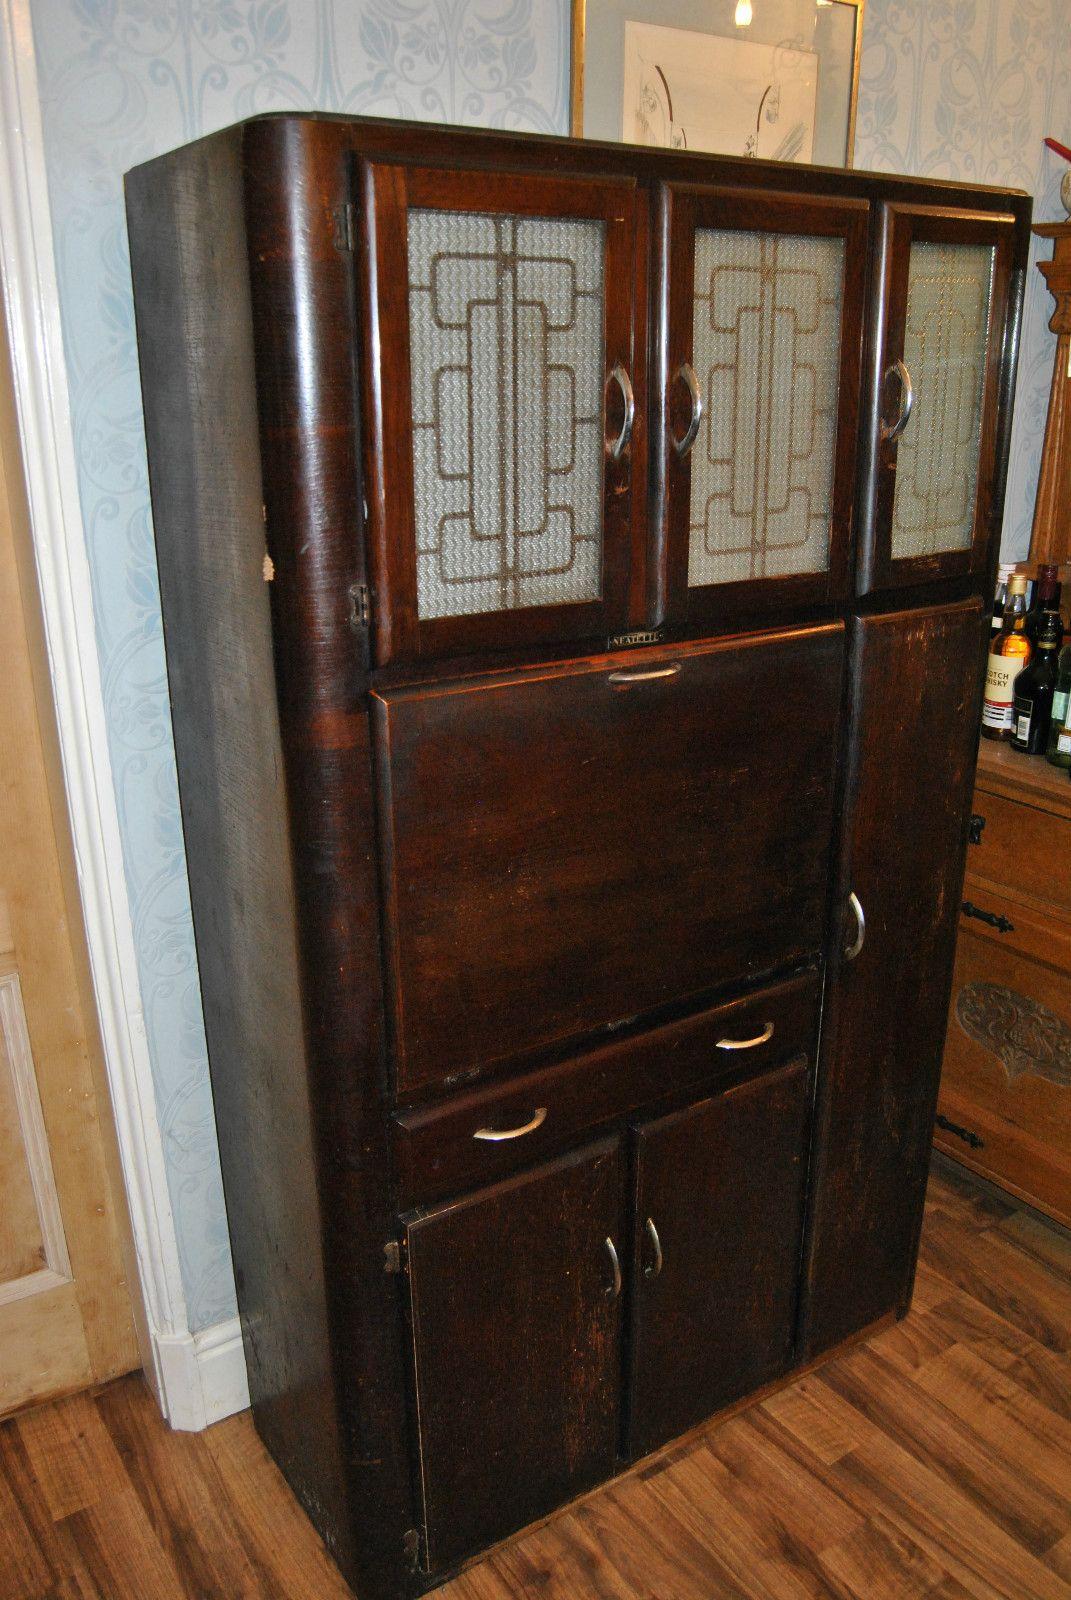 Superb Vintage Retro 1940s 1950s Neatette Combination Kitchen Cupboard Unit EBay 1940